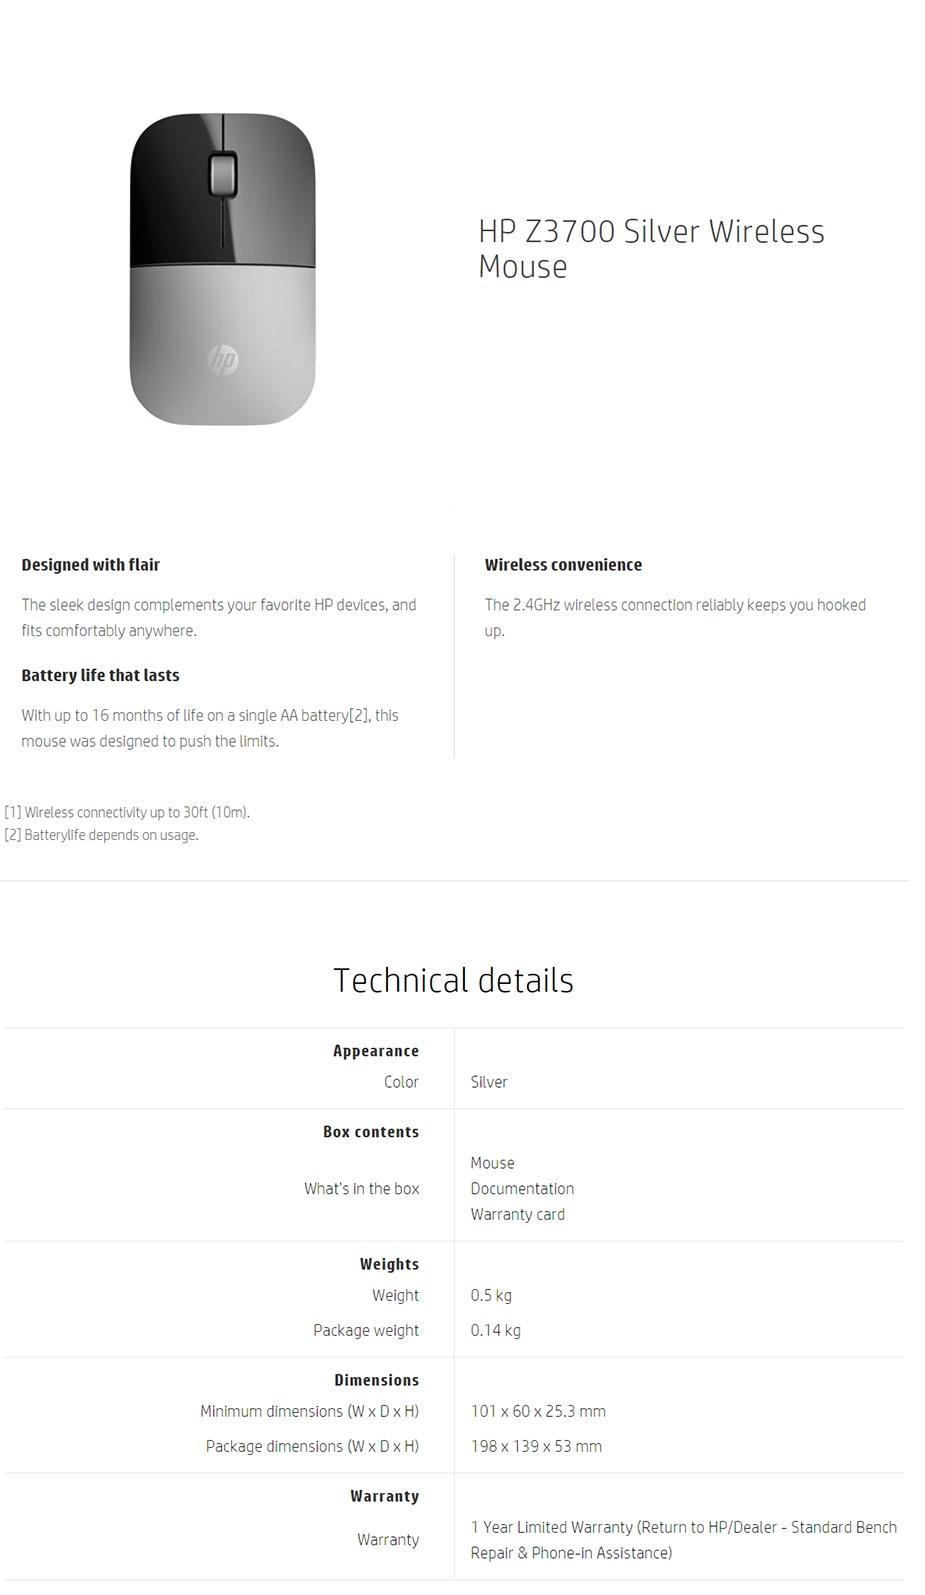 HP Z3700 Wireless Mouse - Silver - Desktop Overview 1